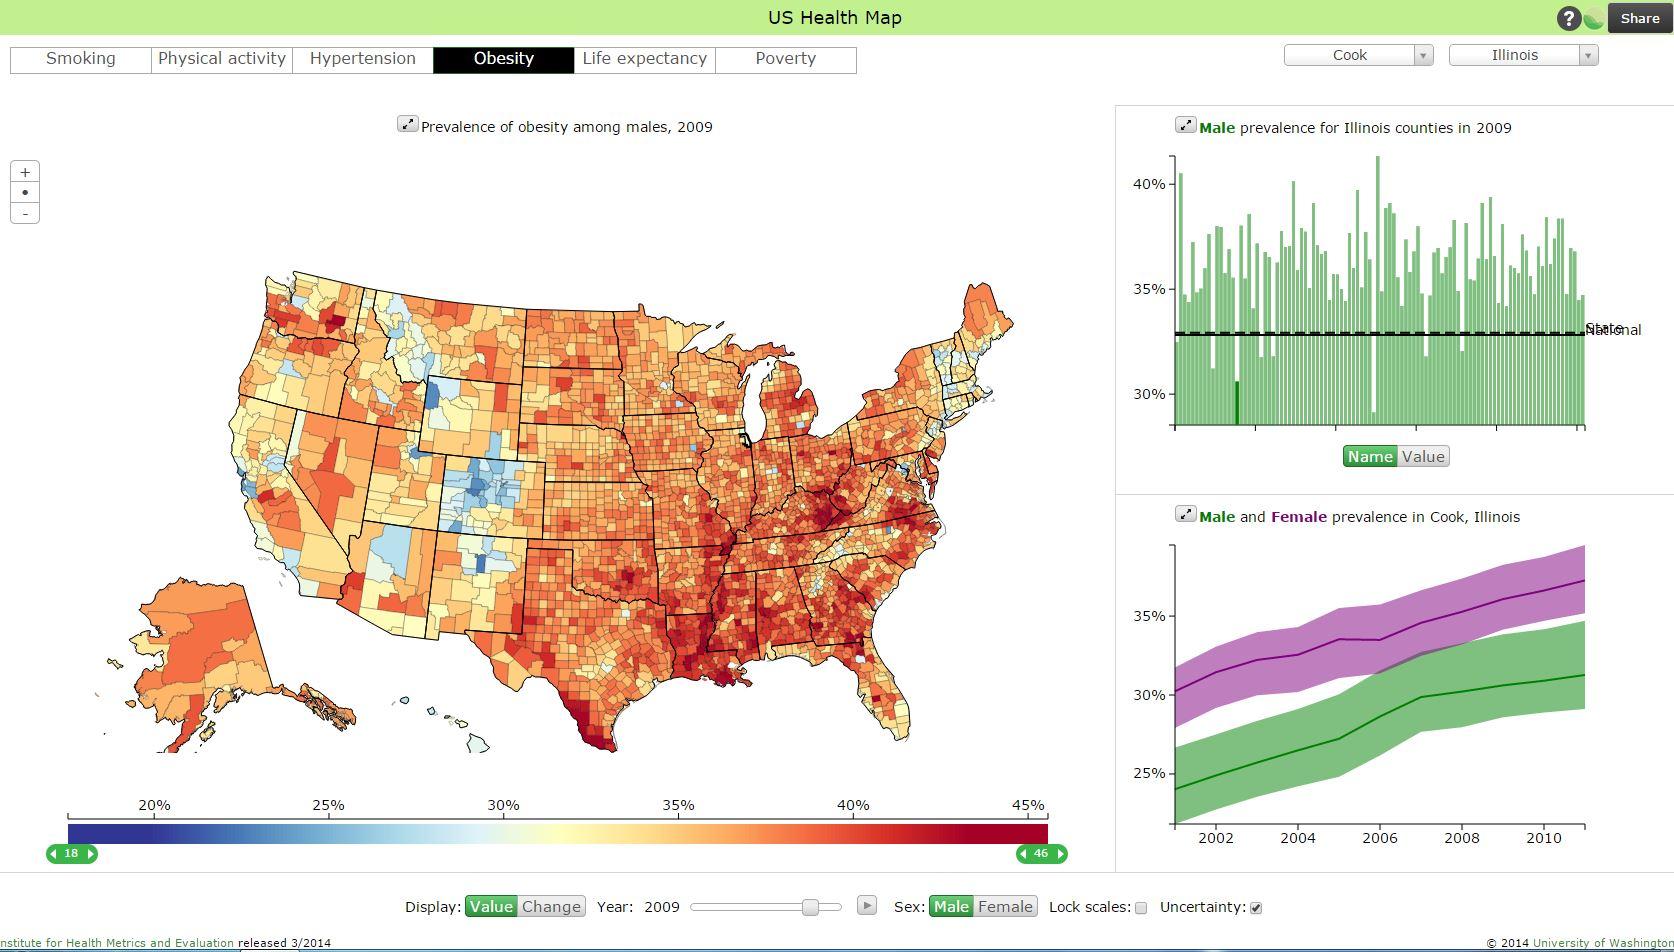 U.S. Health Map